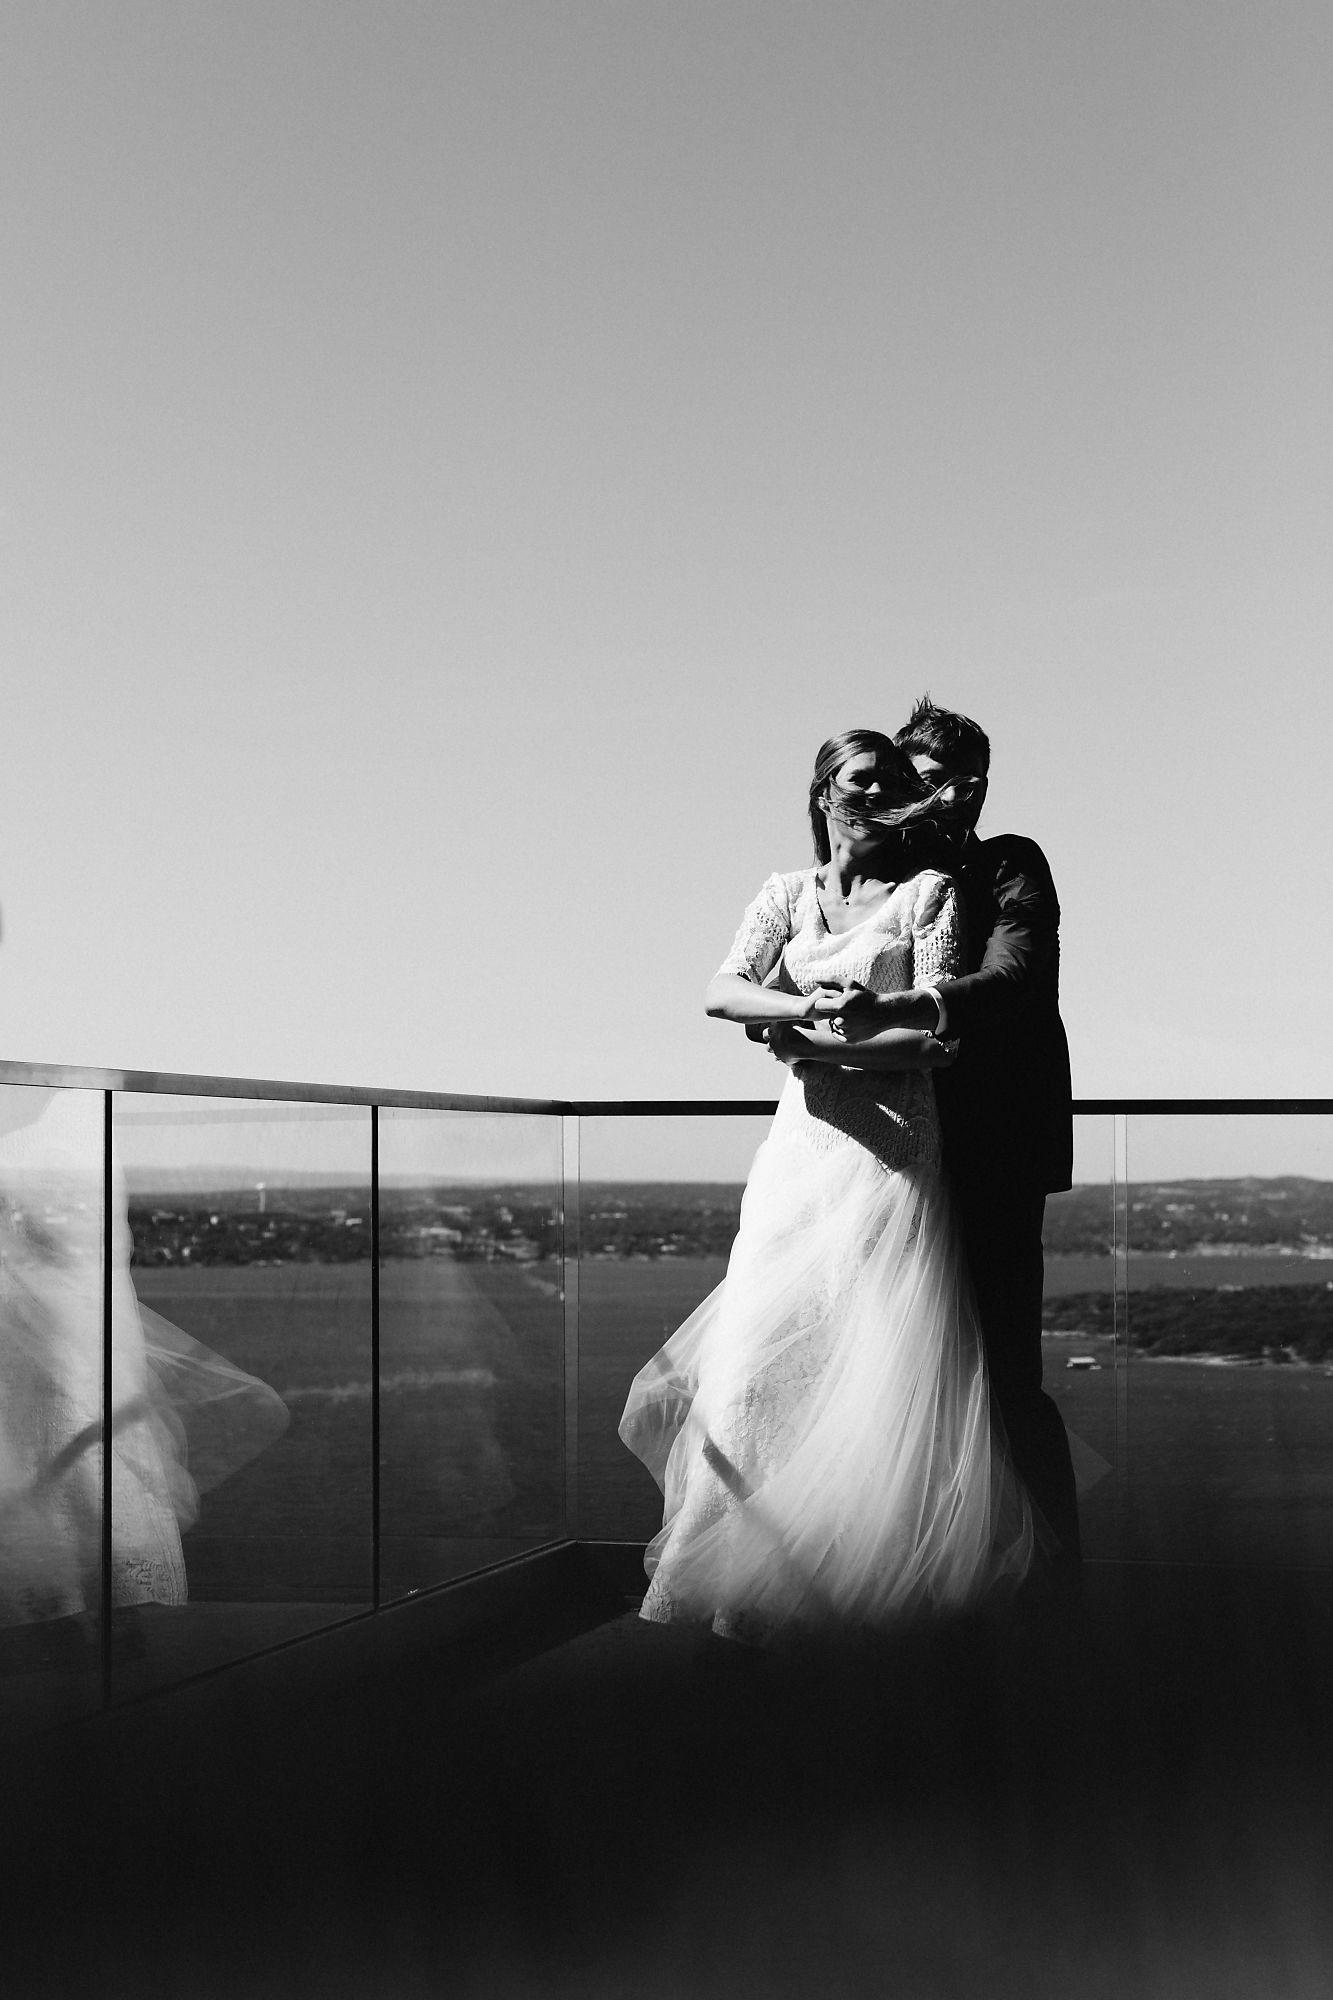 jessica_austin_oasis_brewery_wedding_photos134446.jpg